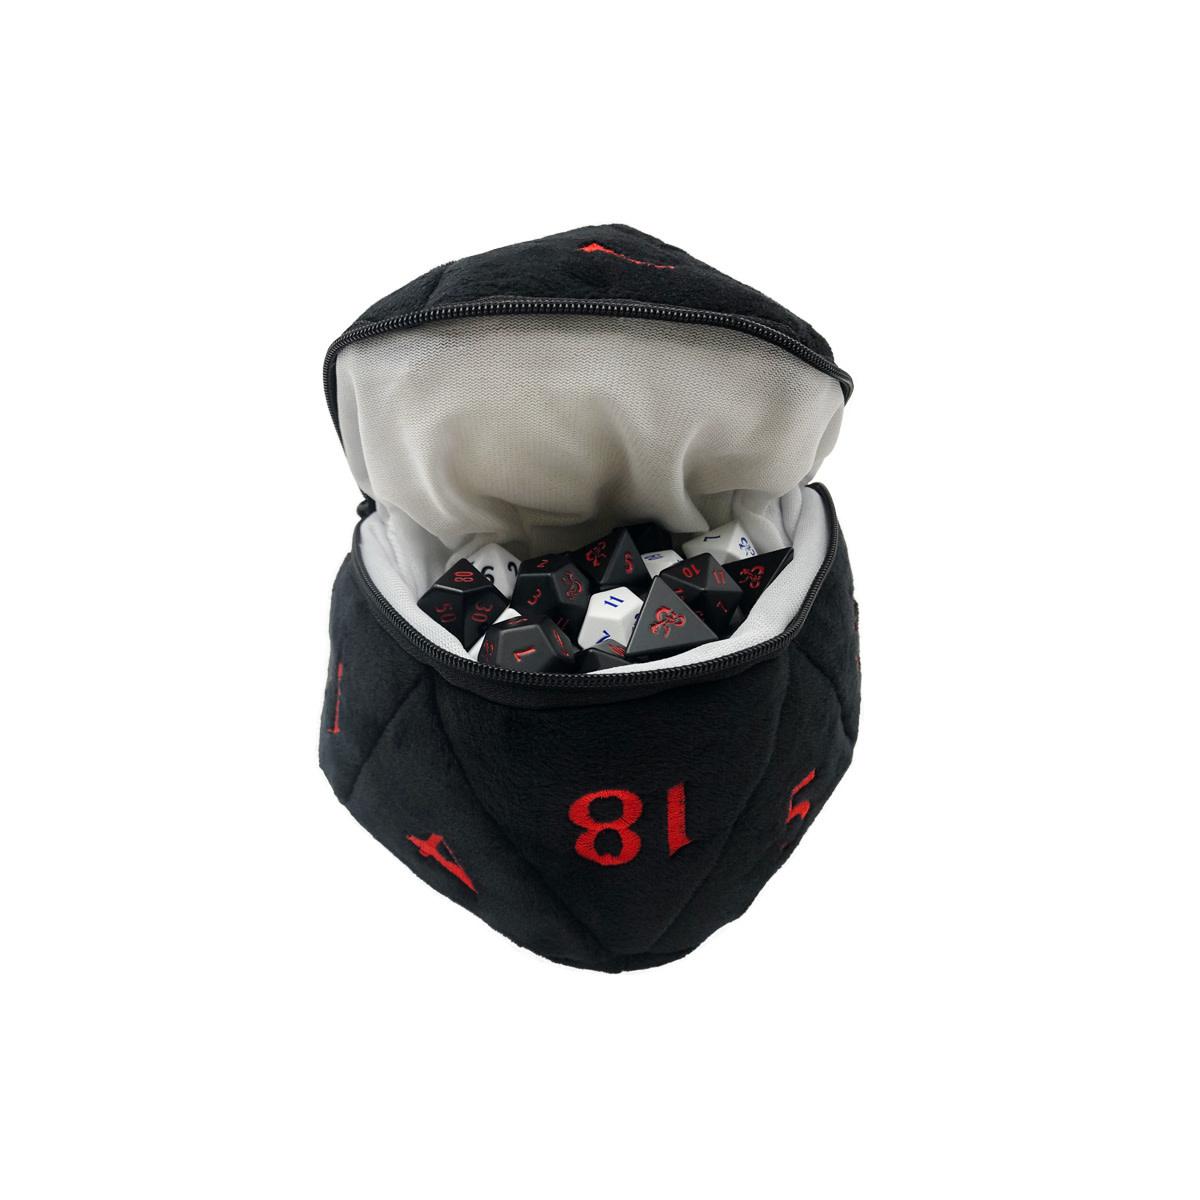 D&D Black and Red D20 Plush Dice Bag